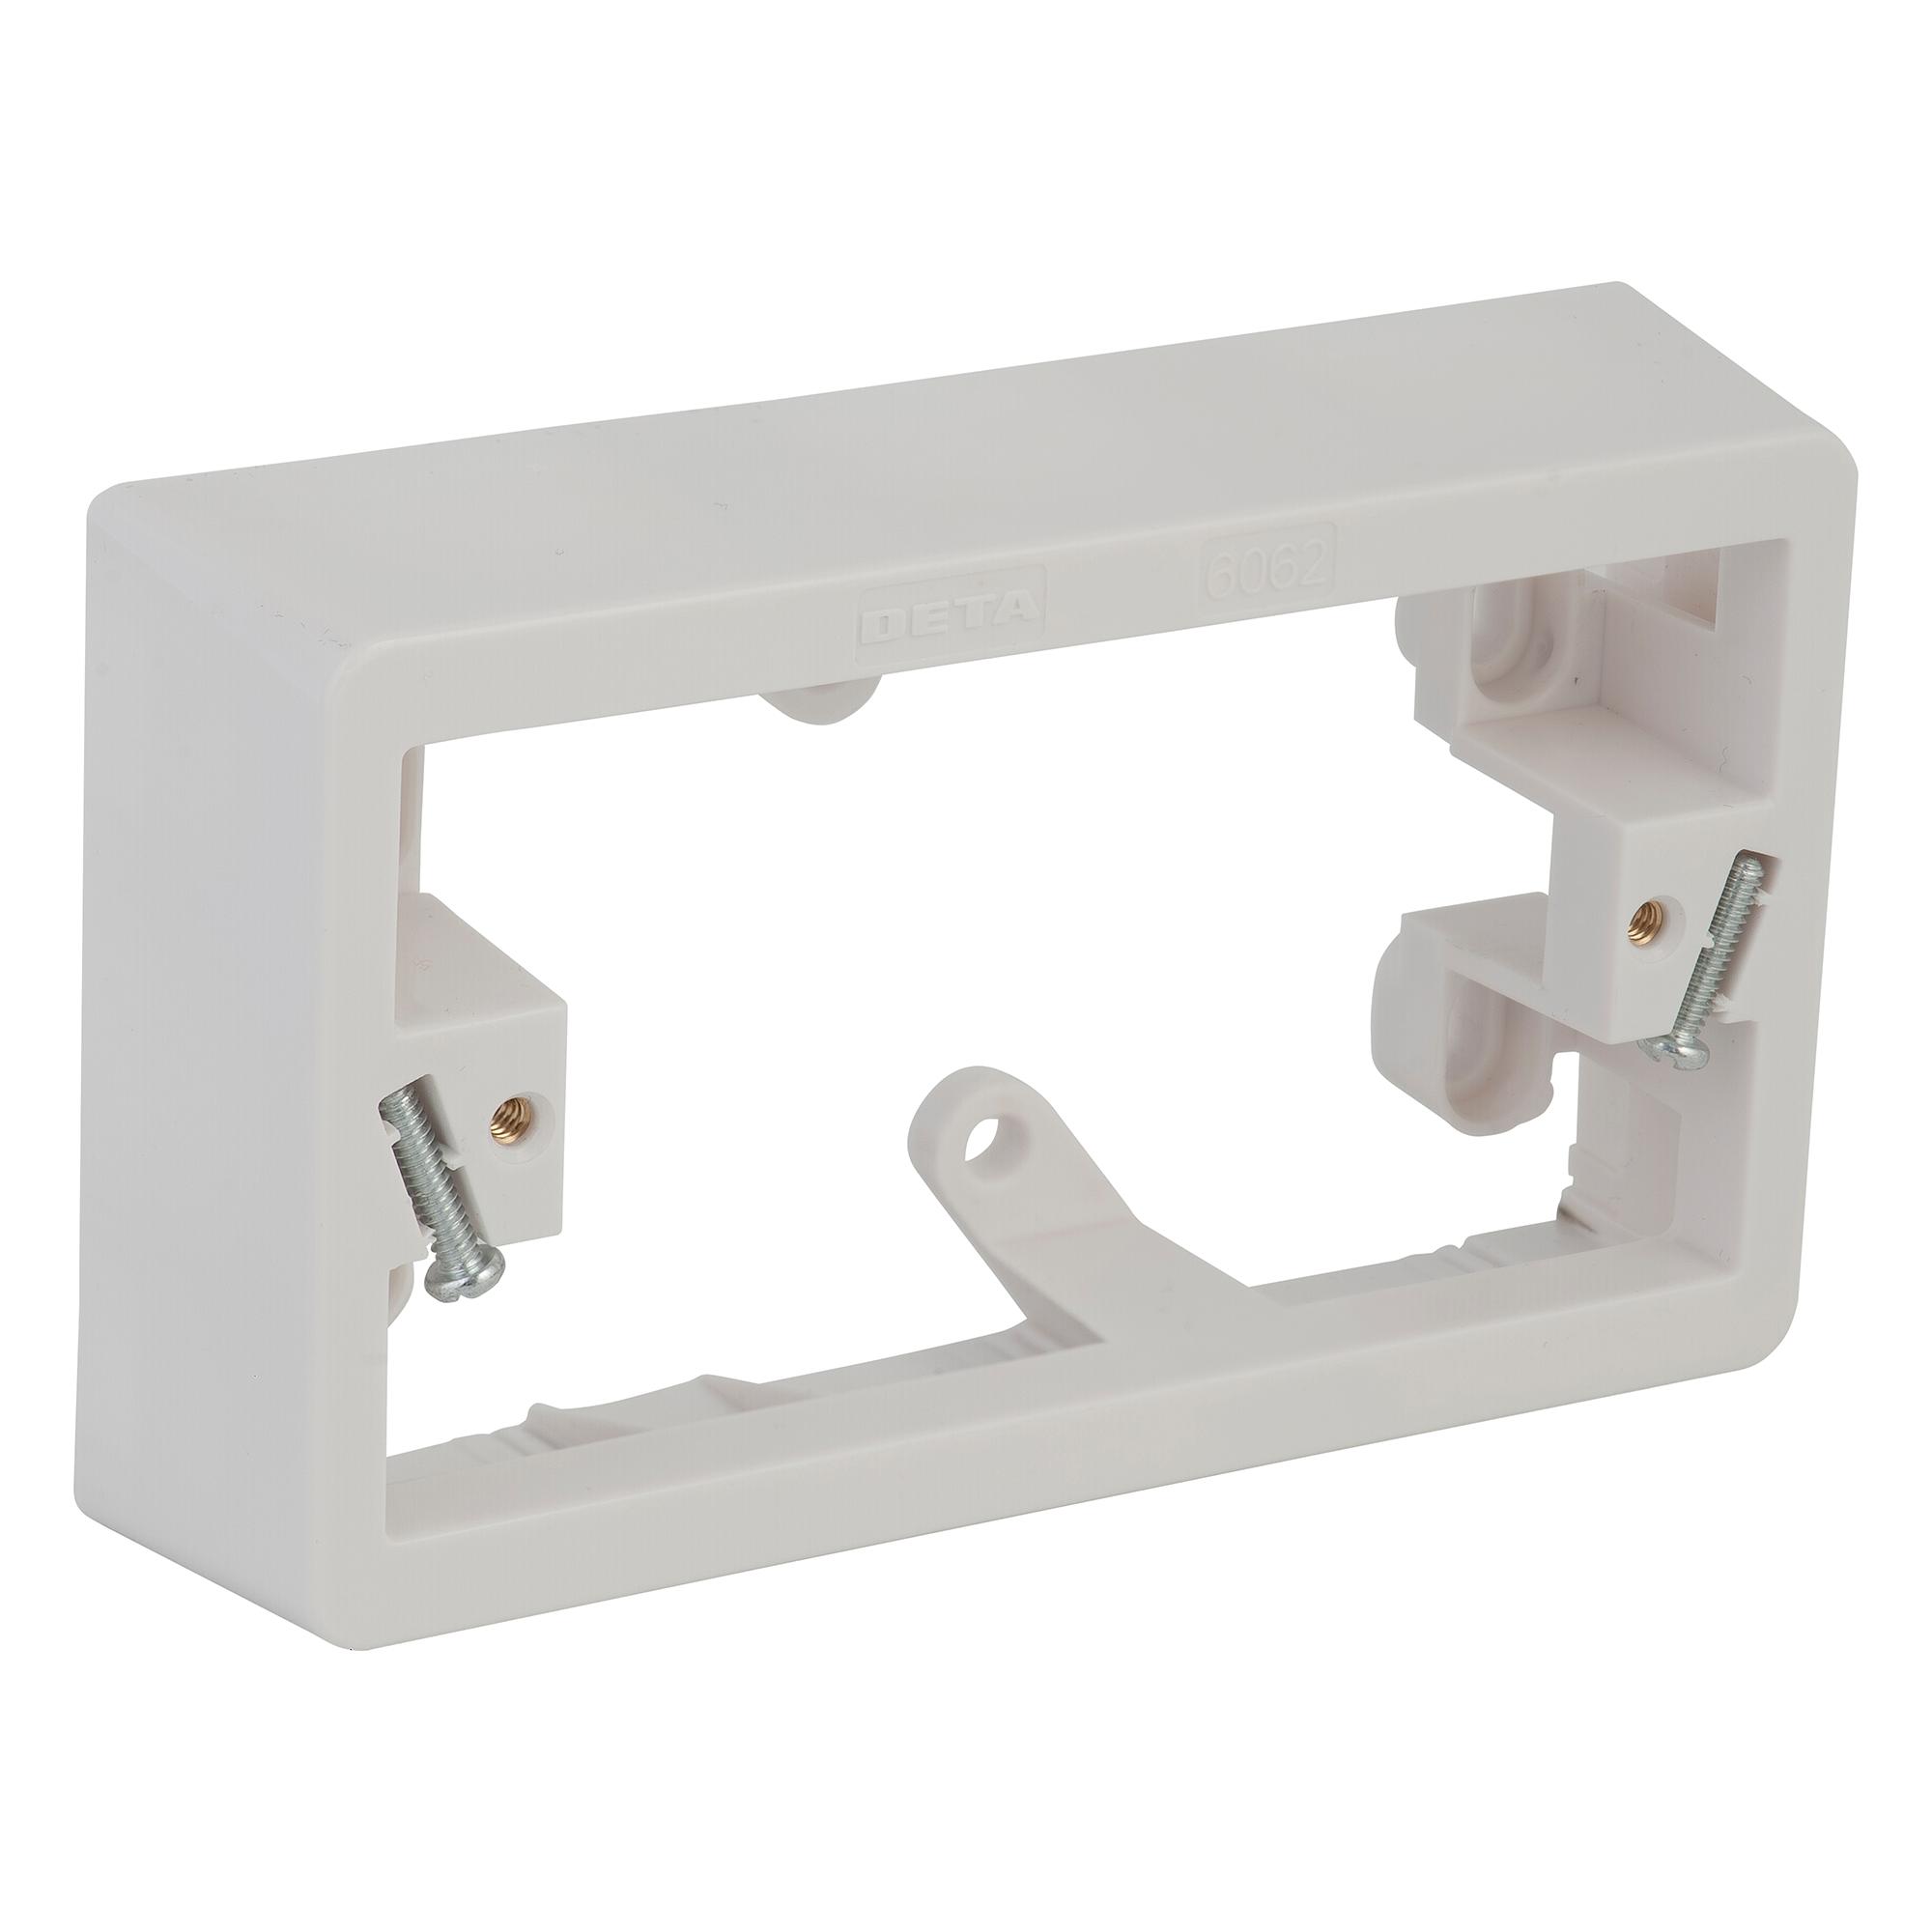 Mounting block for model 6212b